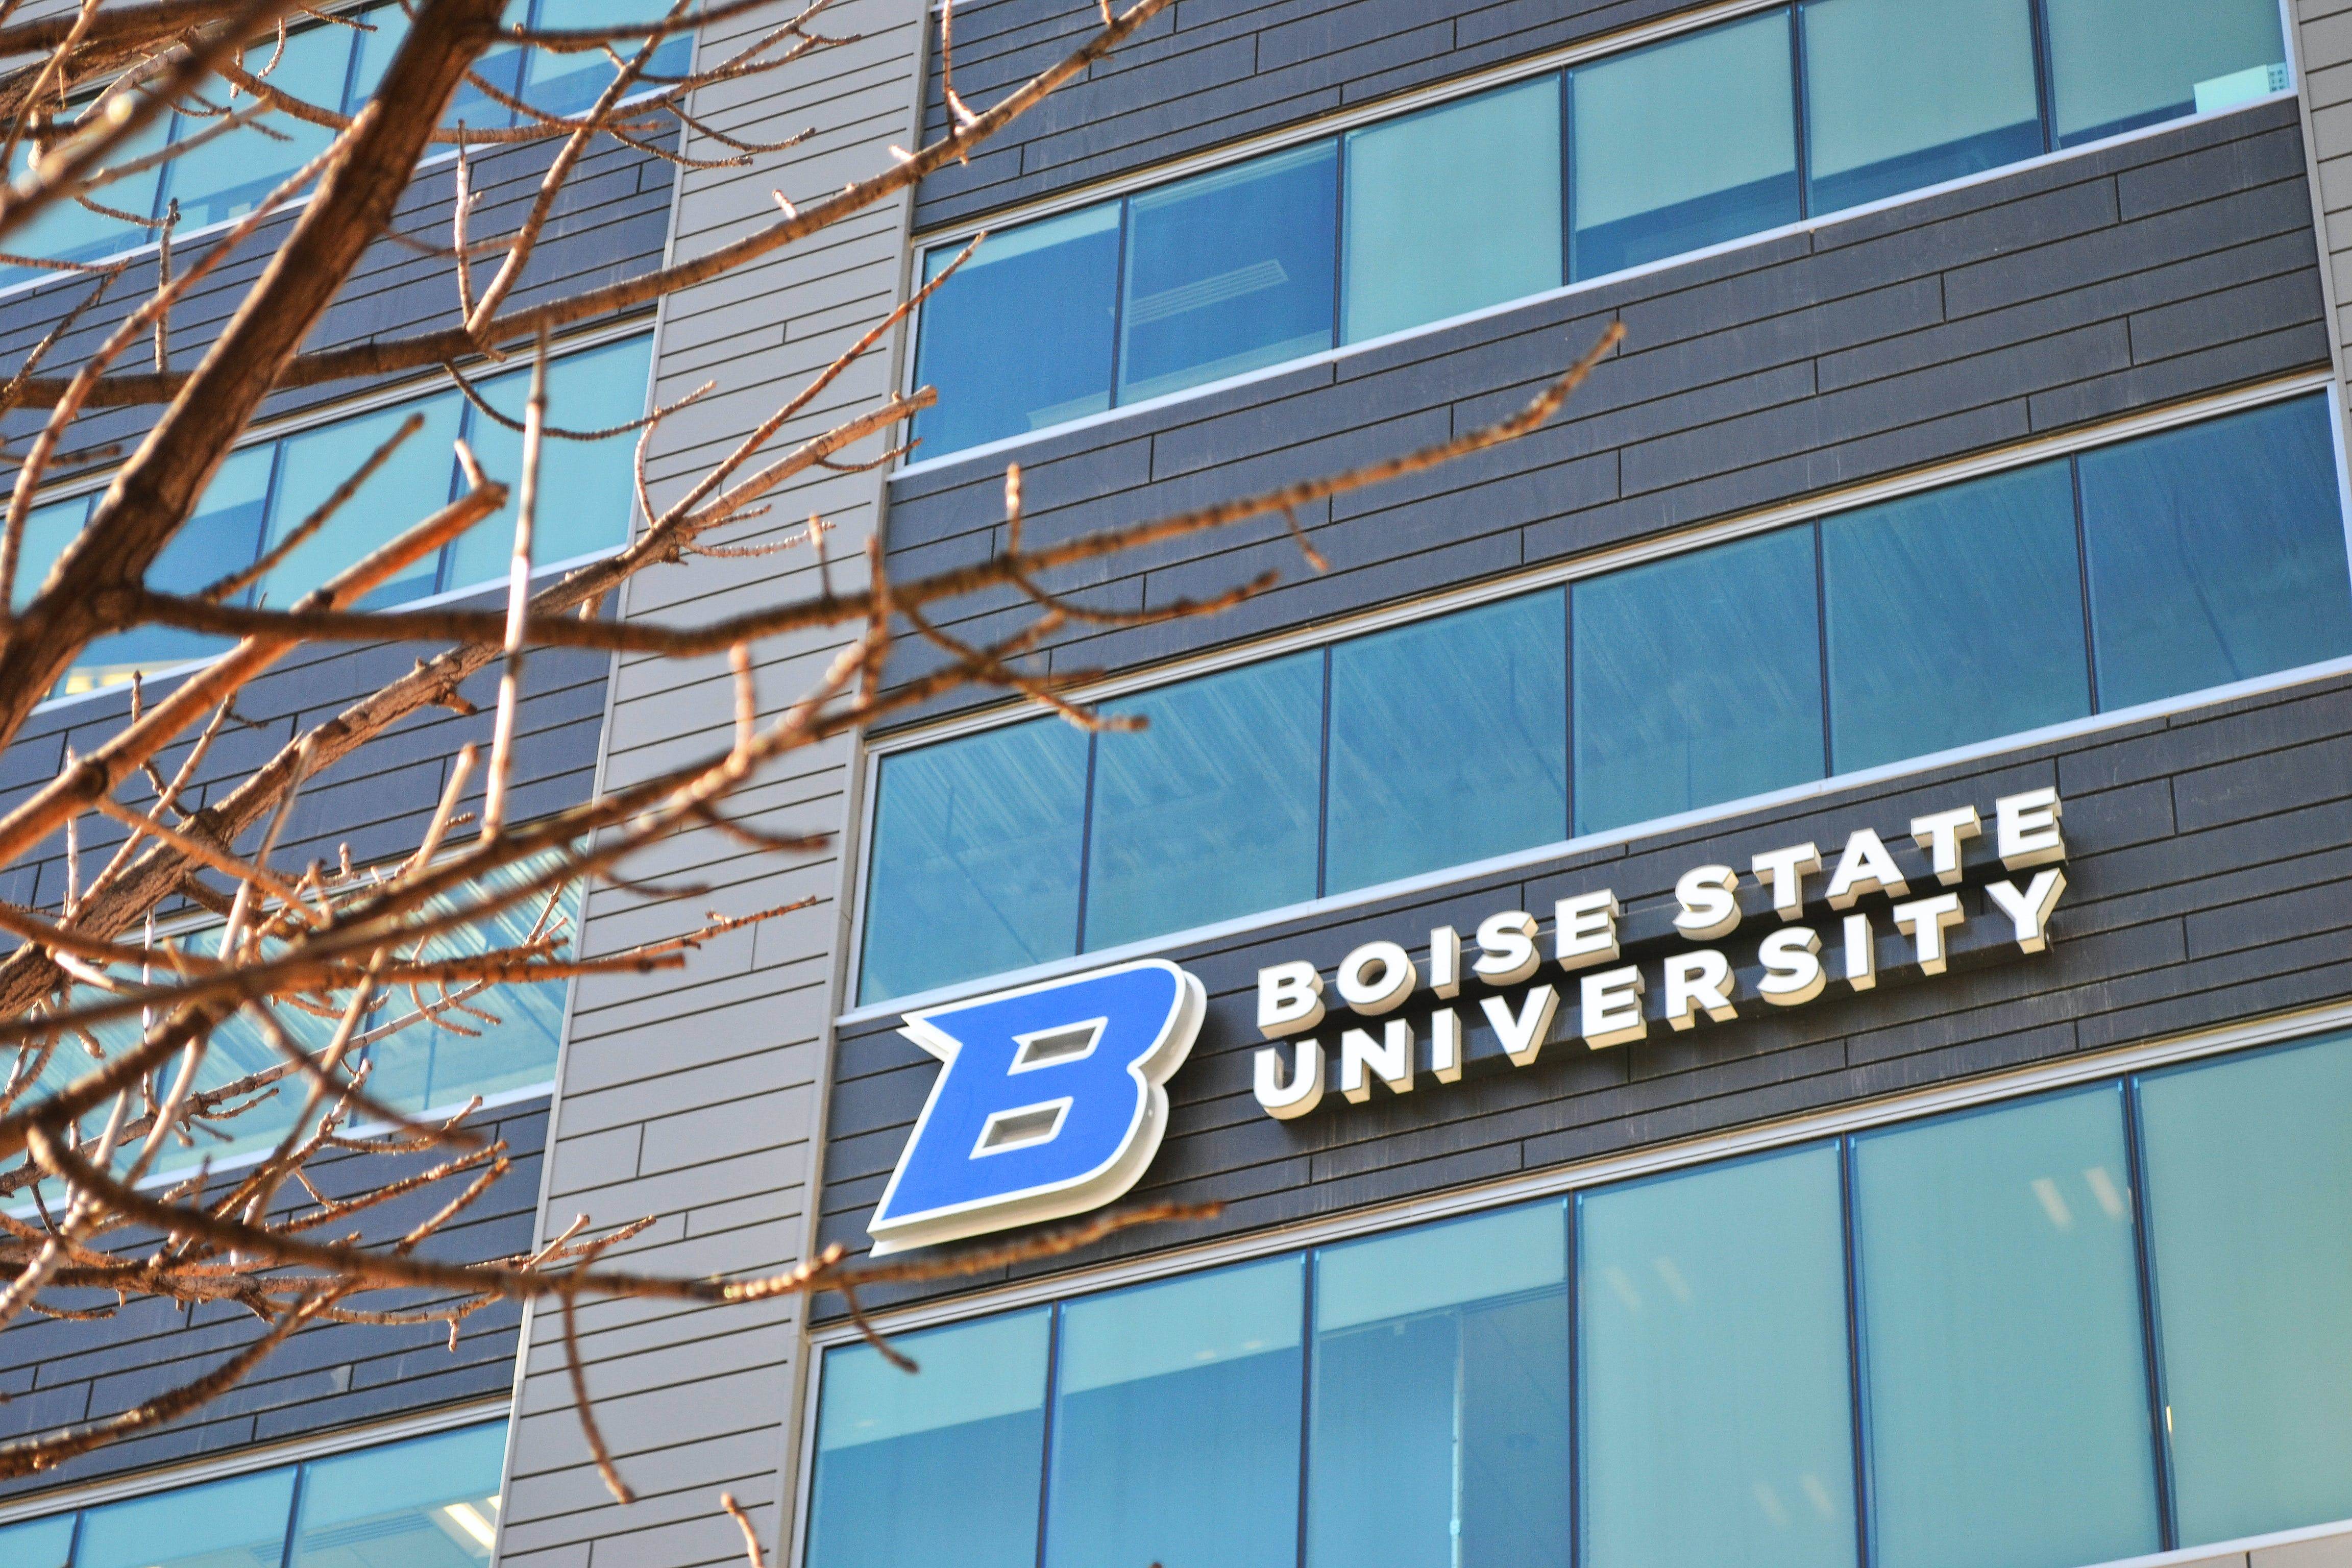 Boise State University Building